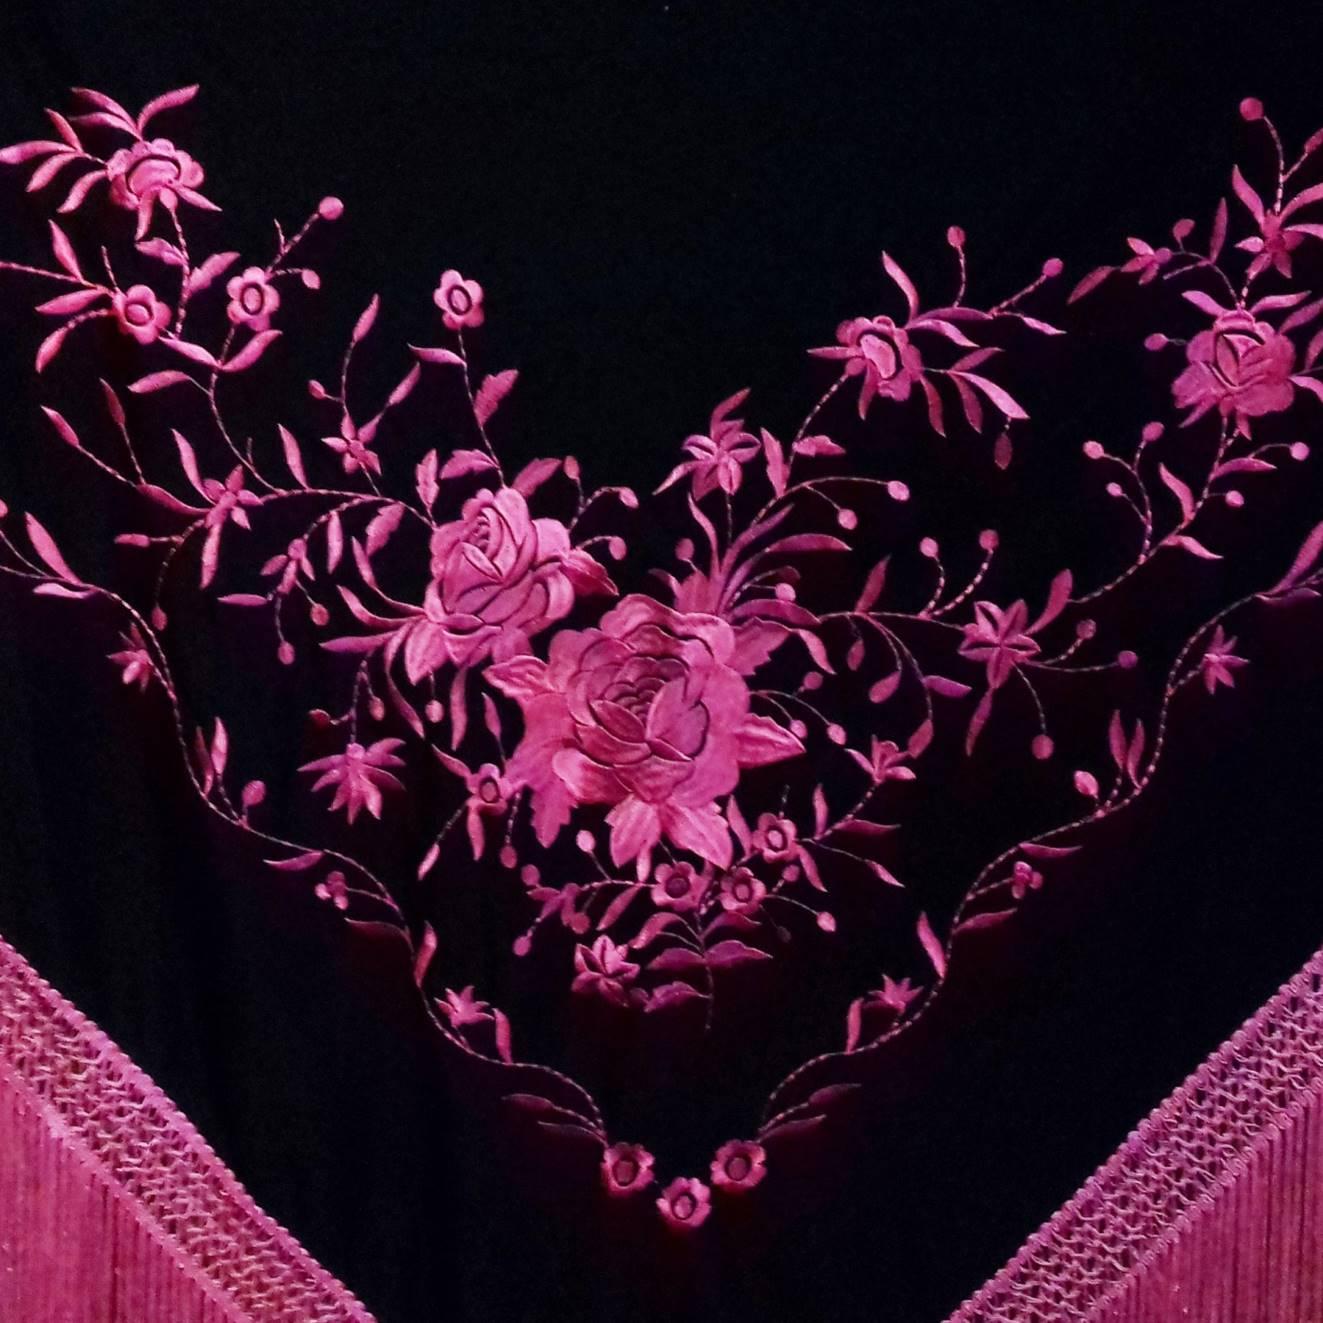 XALE ESPANHOL grande bordado 190x90cm flamenco pink preto